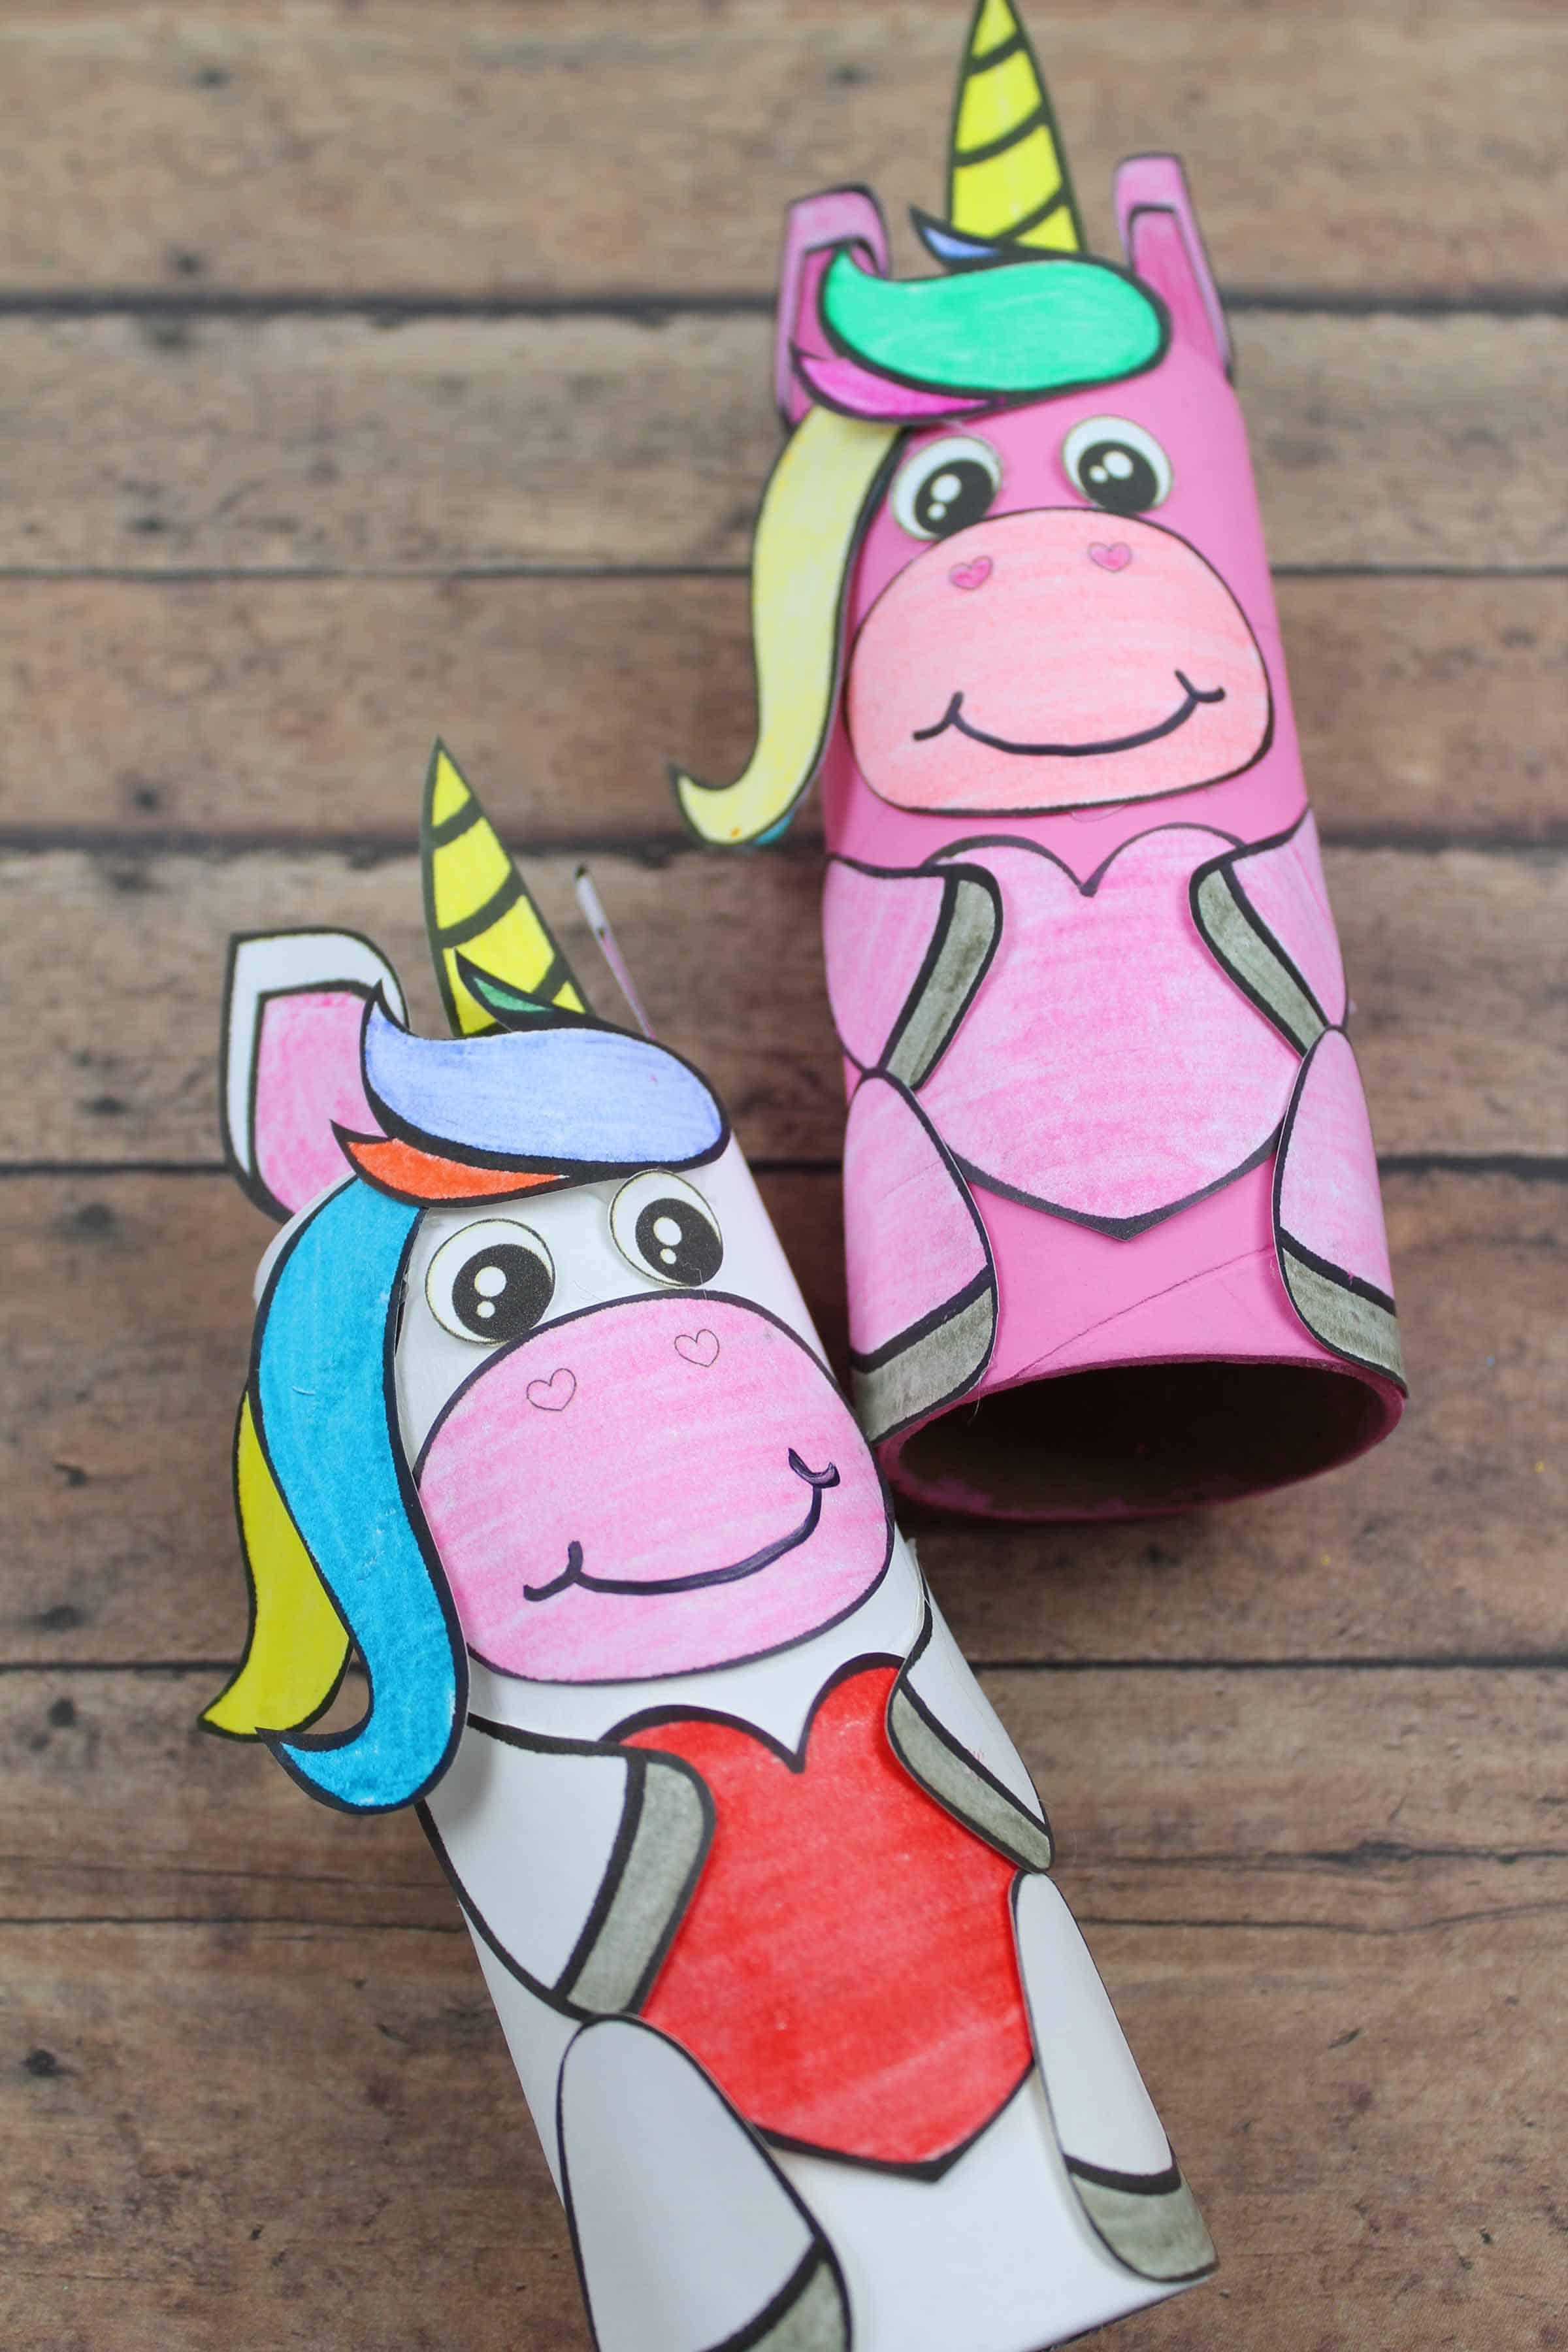 unicorn craft idea for preschool kids